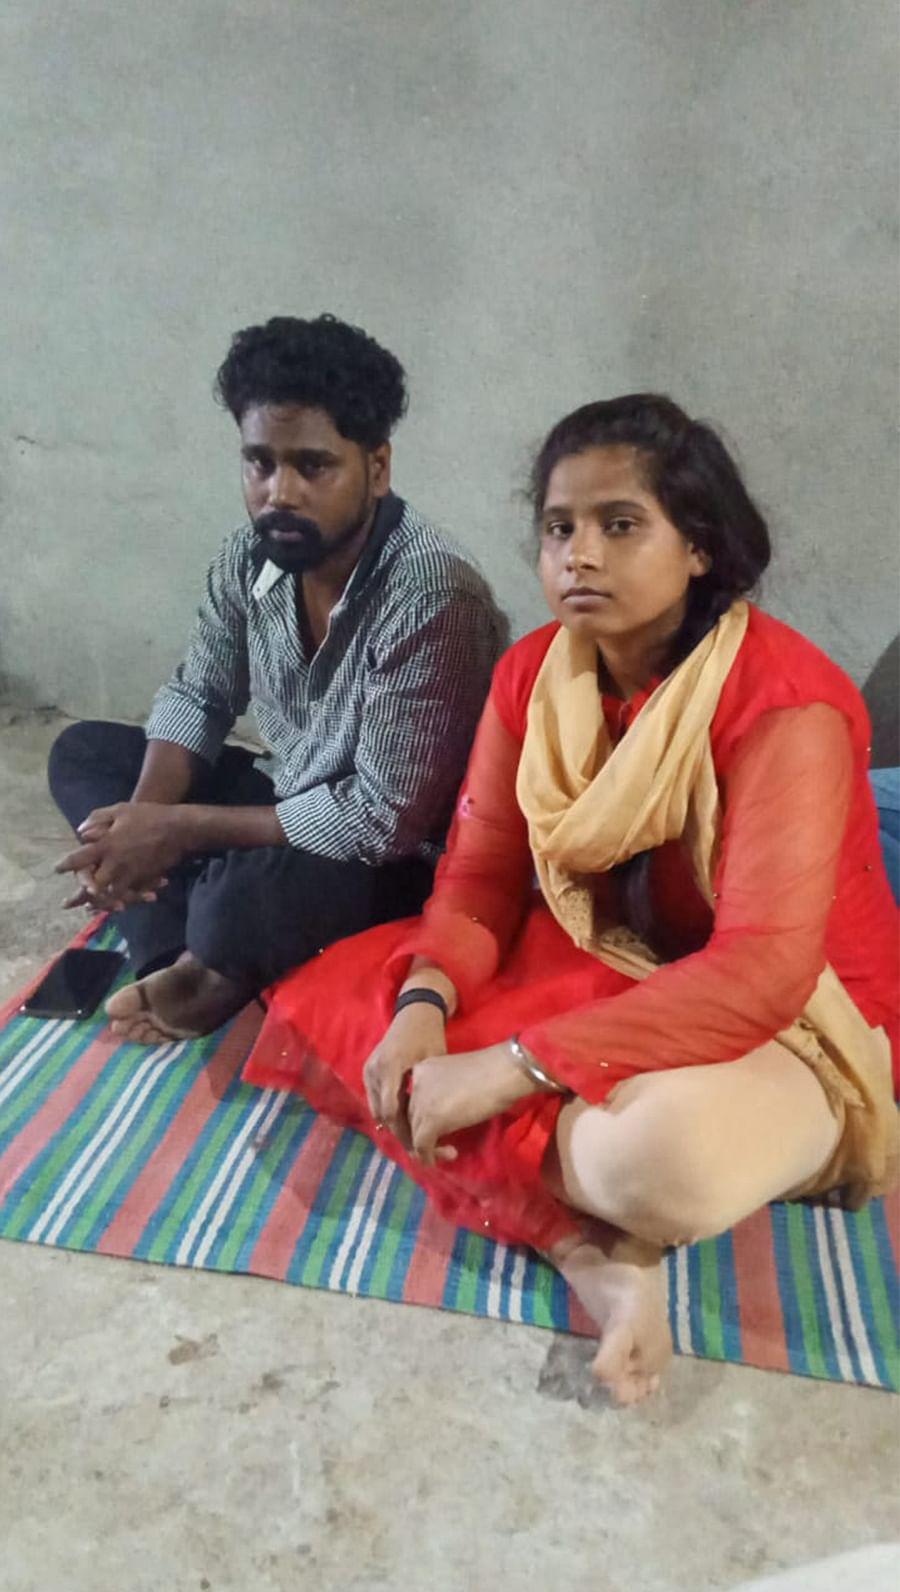 Santosh and Bharati.